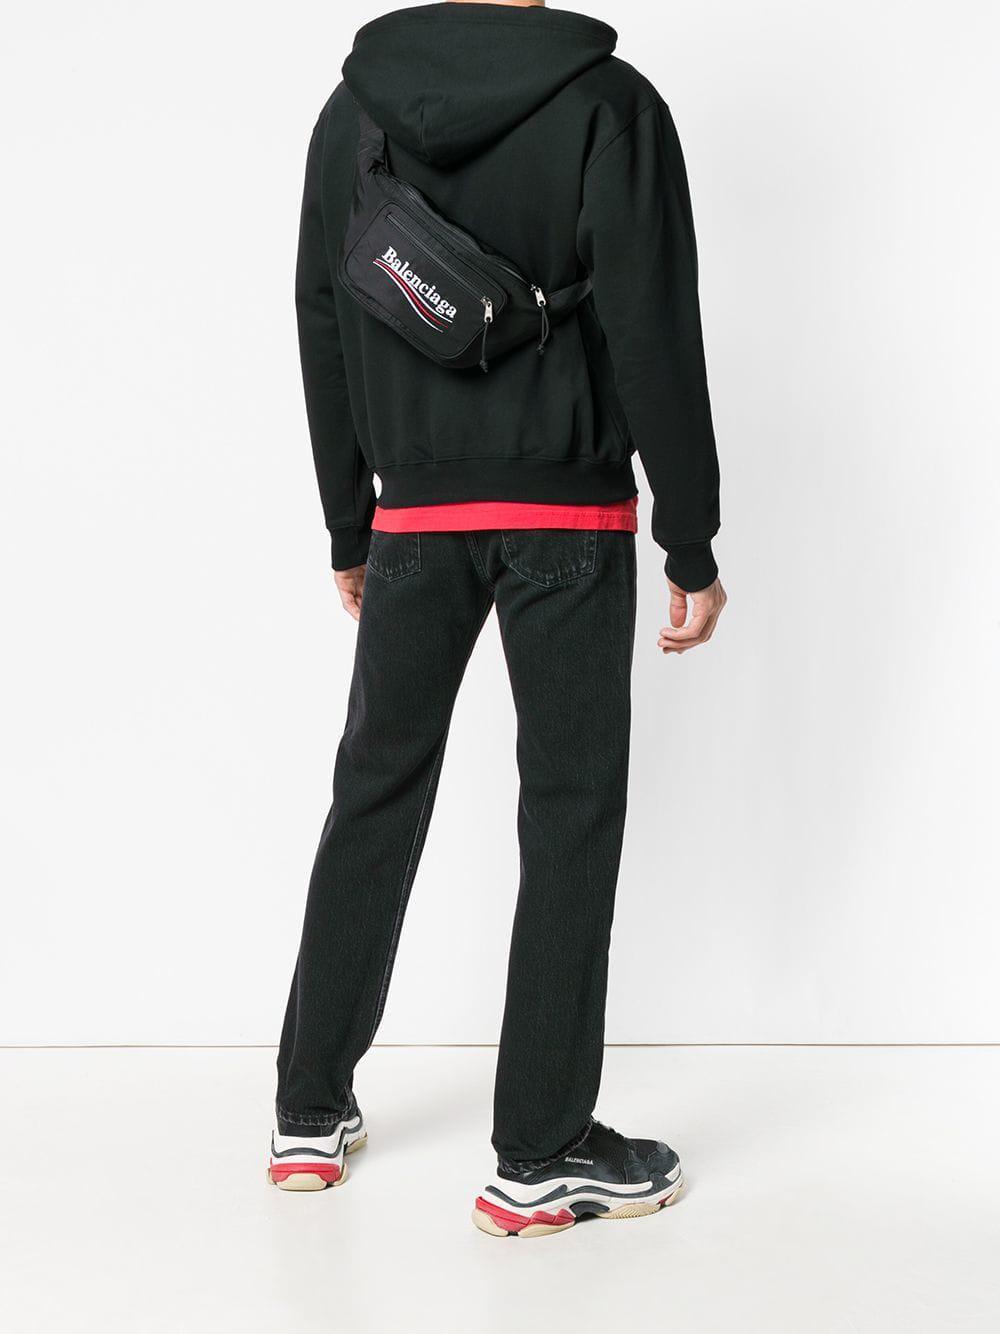 fcd80e9441f963 Balenciaga Explorer Belt Bag in Black for Men - Save 37% - Lyst